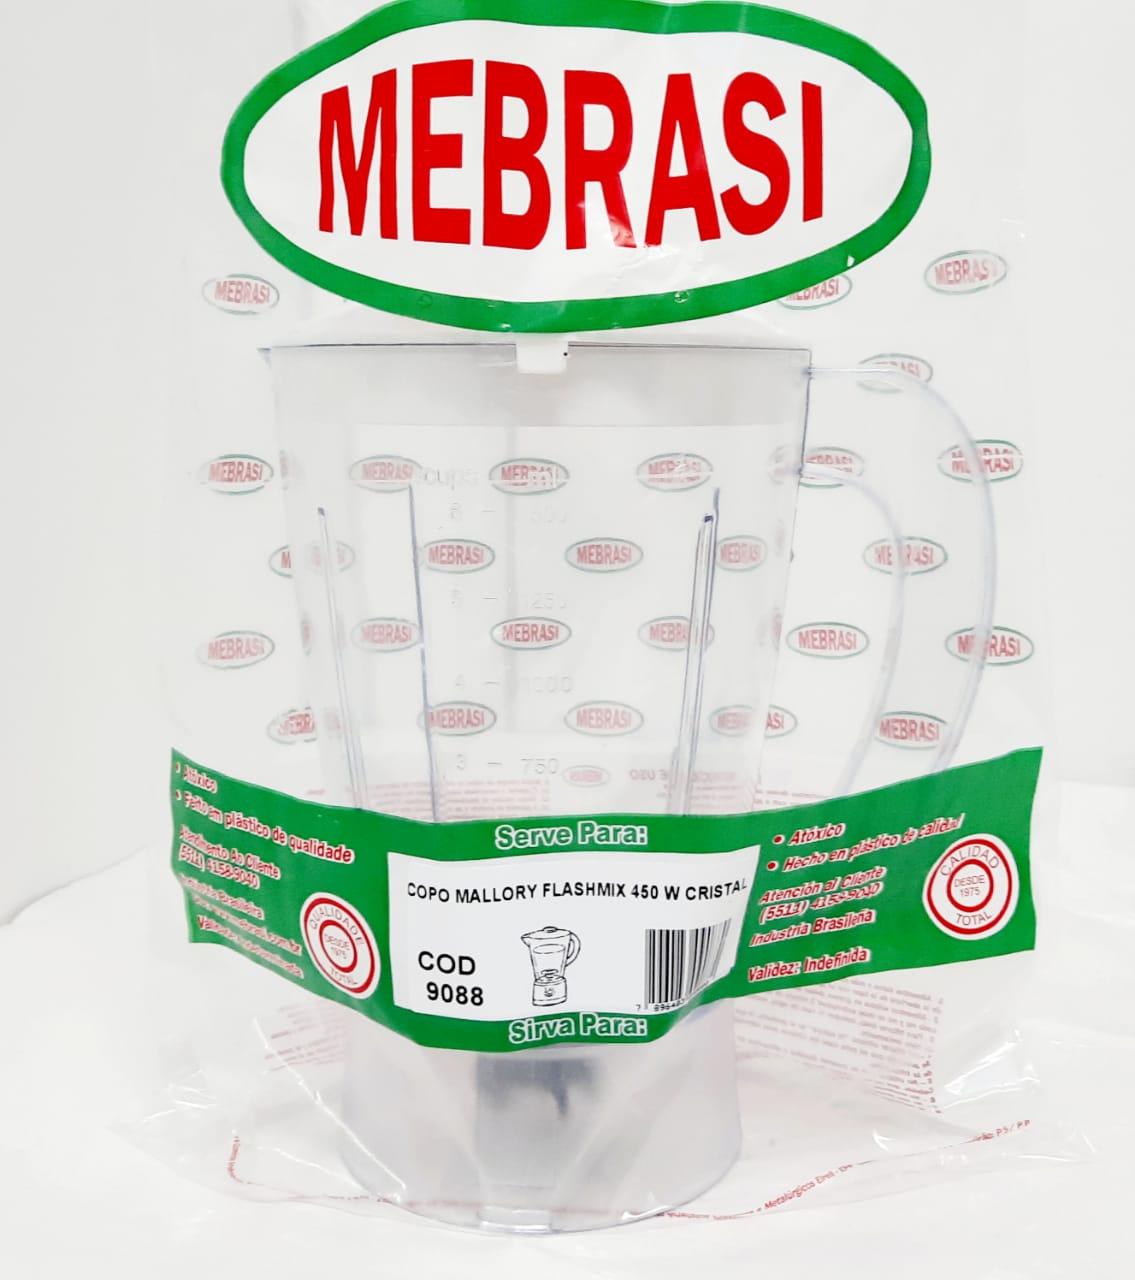 Copo MALL CRS FLASMIX 450W - Mebrasi